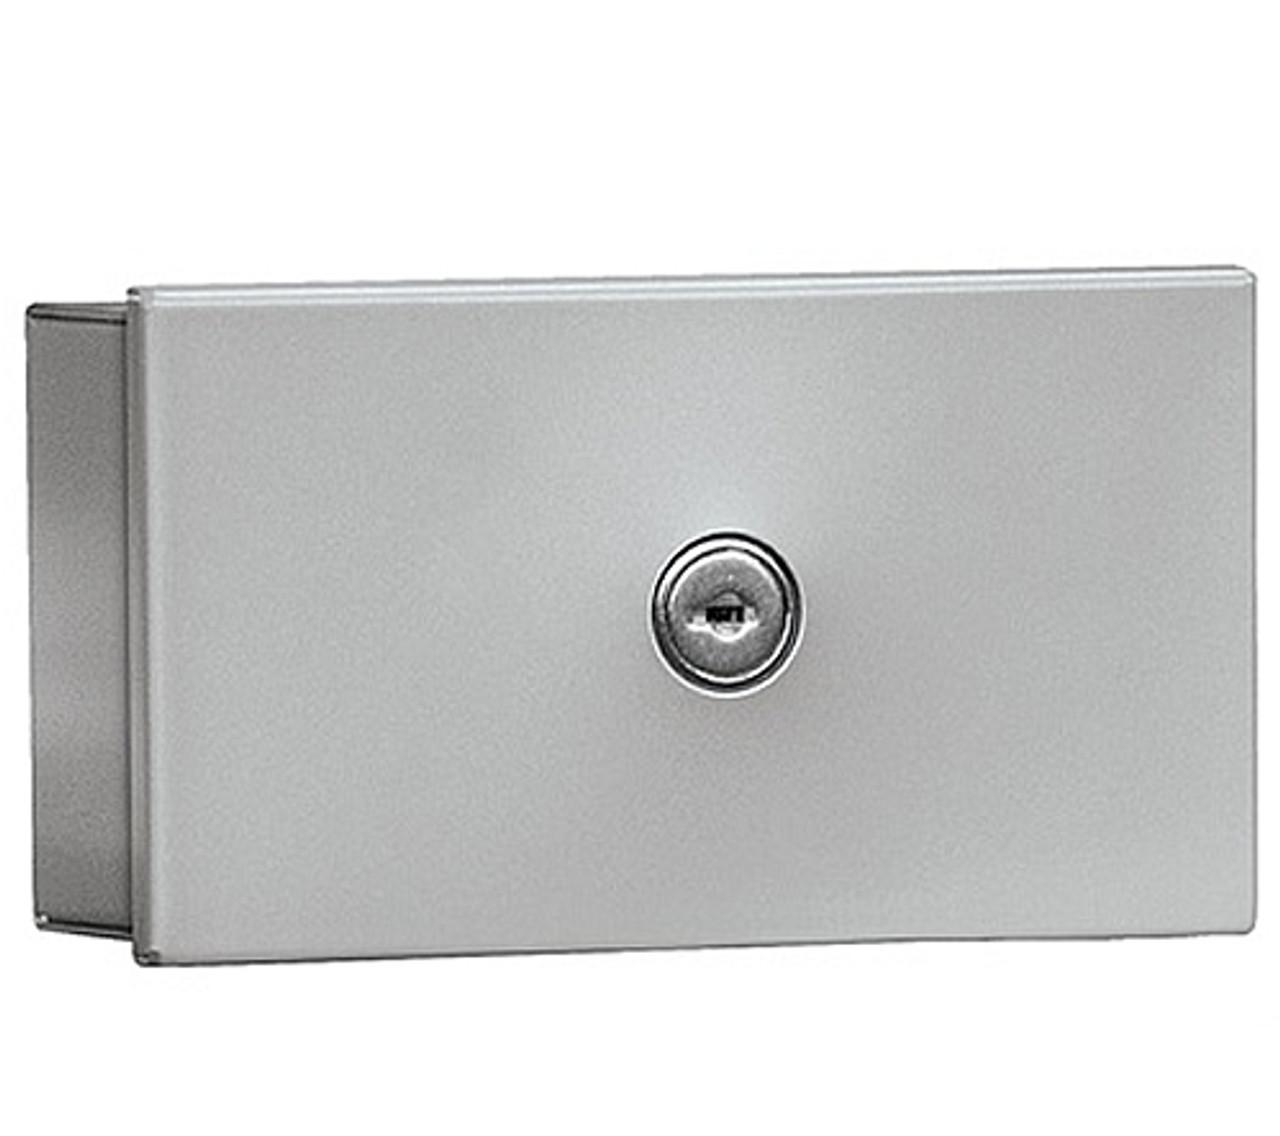 Key Locker Wall Mounted Locking Key Box Key Storage Lock